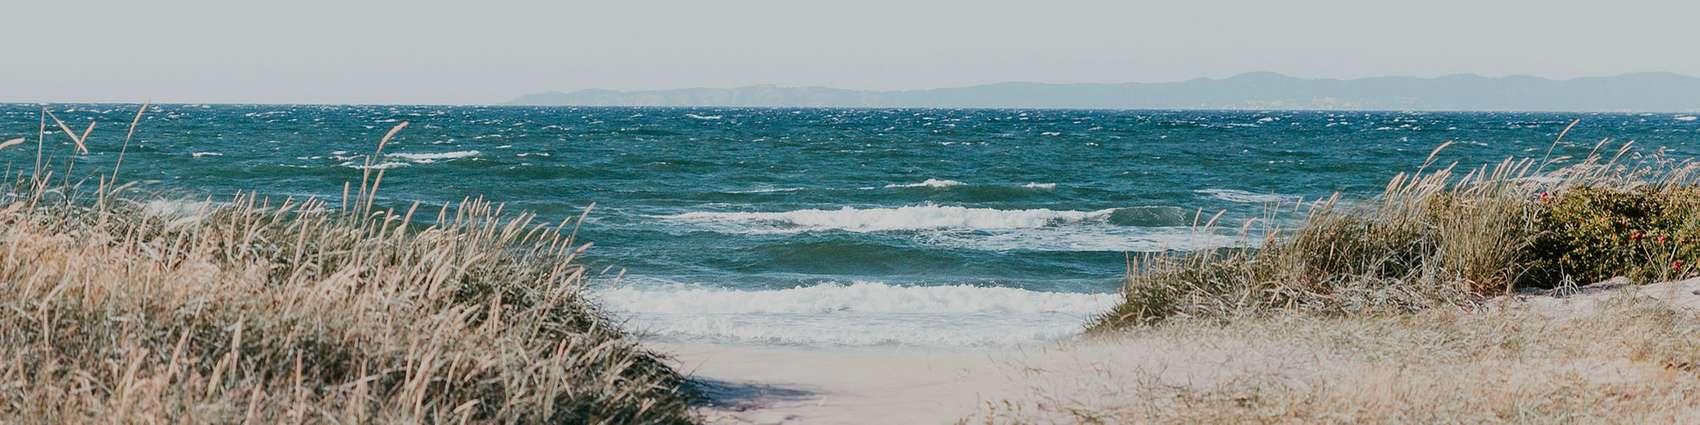 vores oplevelse paa marienlyst strandhotel